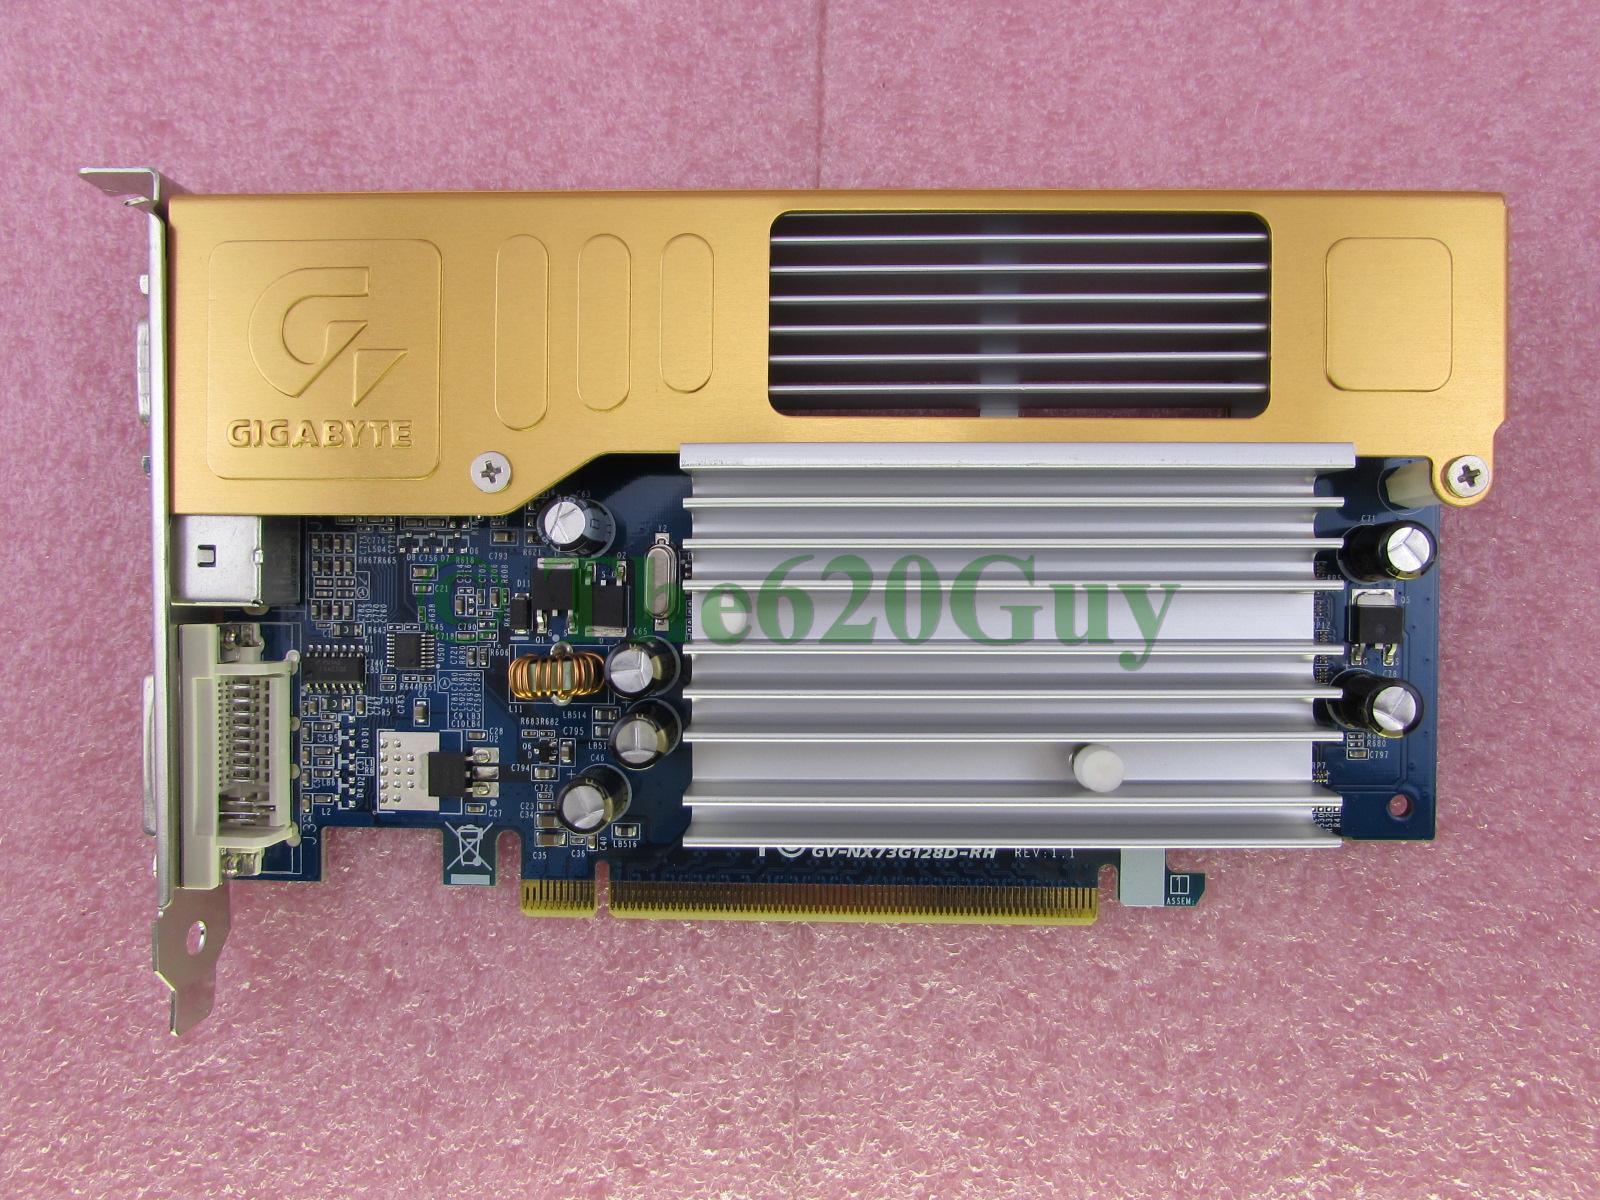 GIGABYTE GV-NX73G128D WINDOWS 7 DRIVER DOWNLOAD